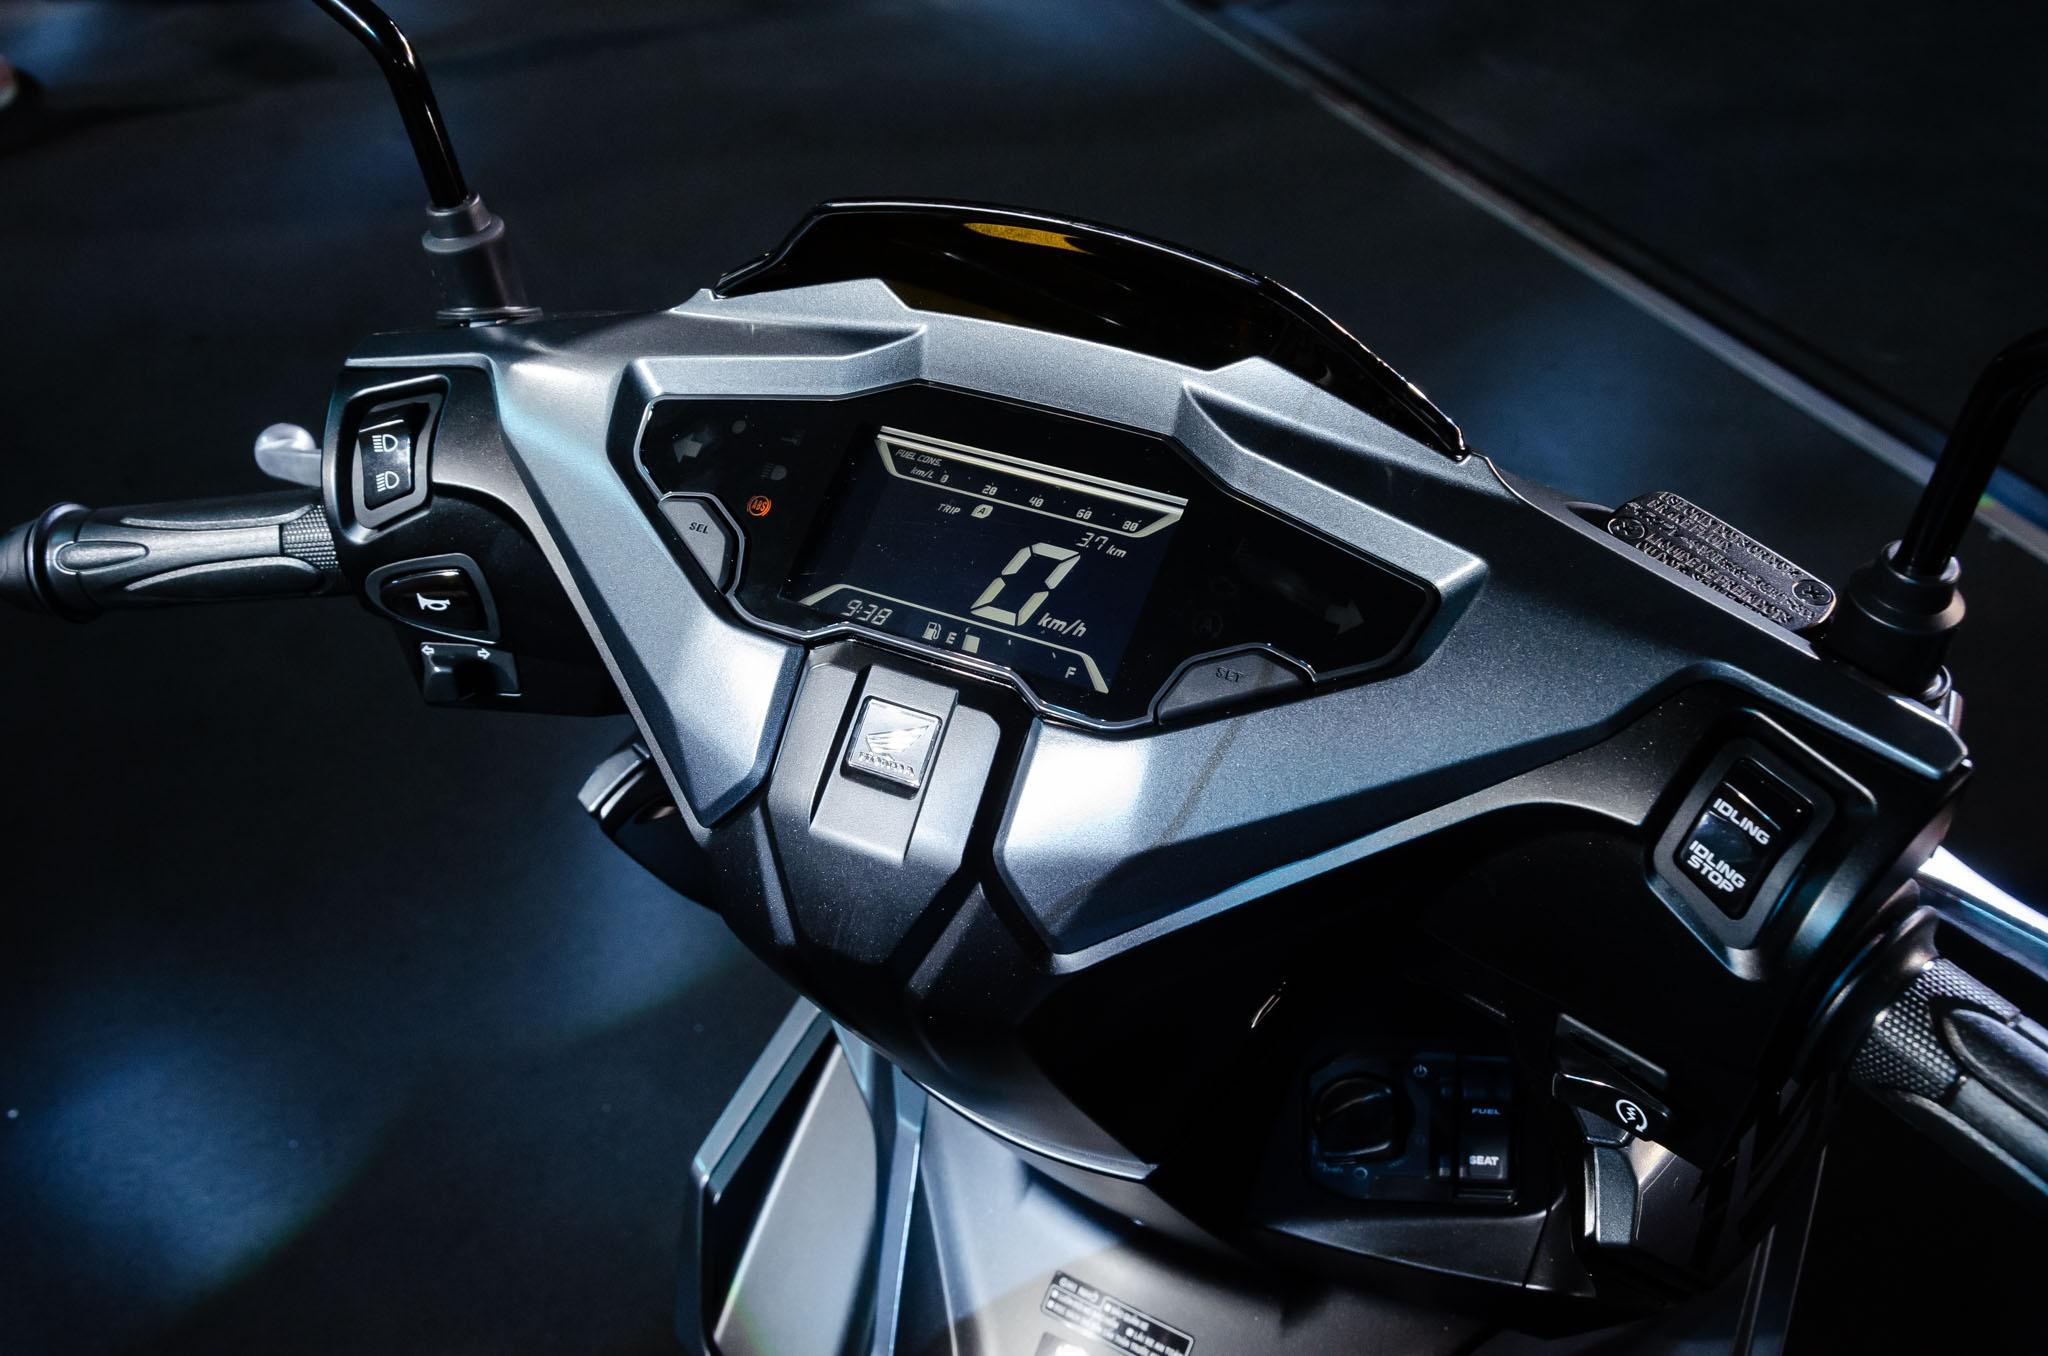 So sanh Honda Air Blade 150 va Yamaha FreeGo S anh 8